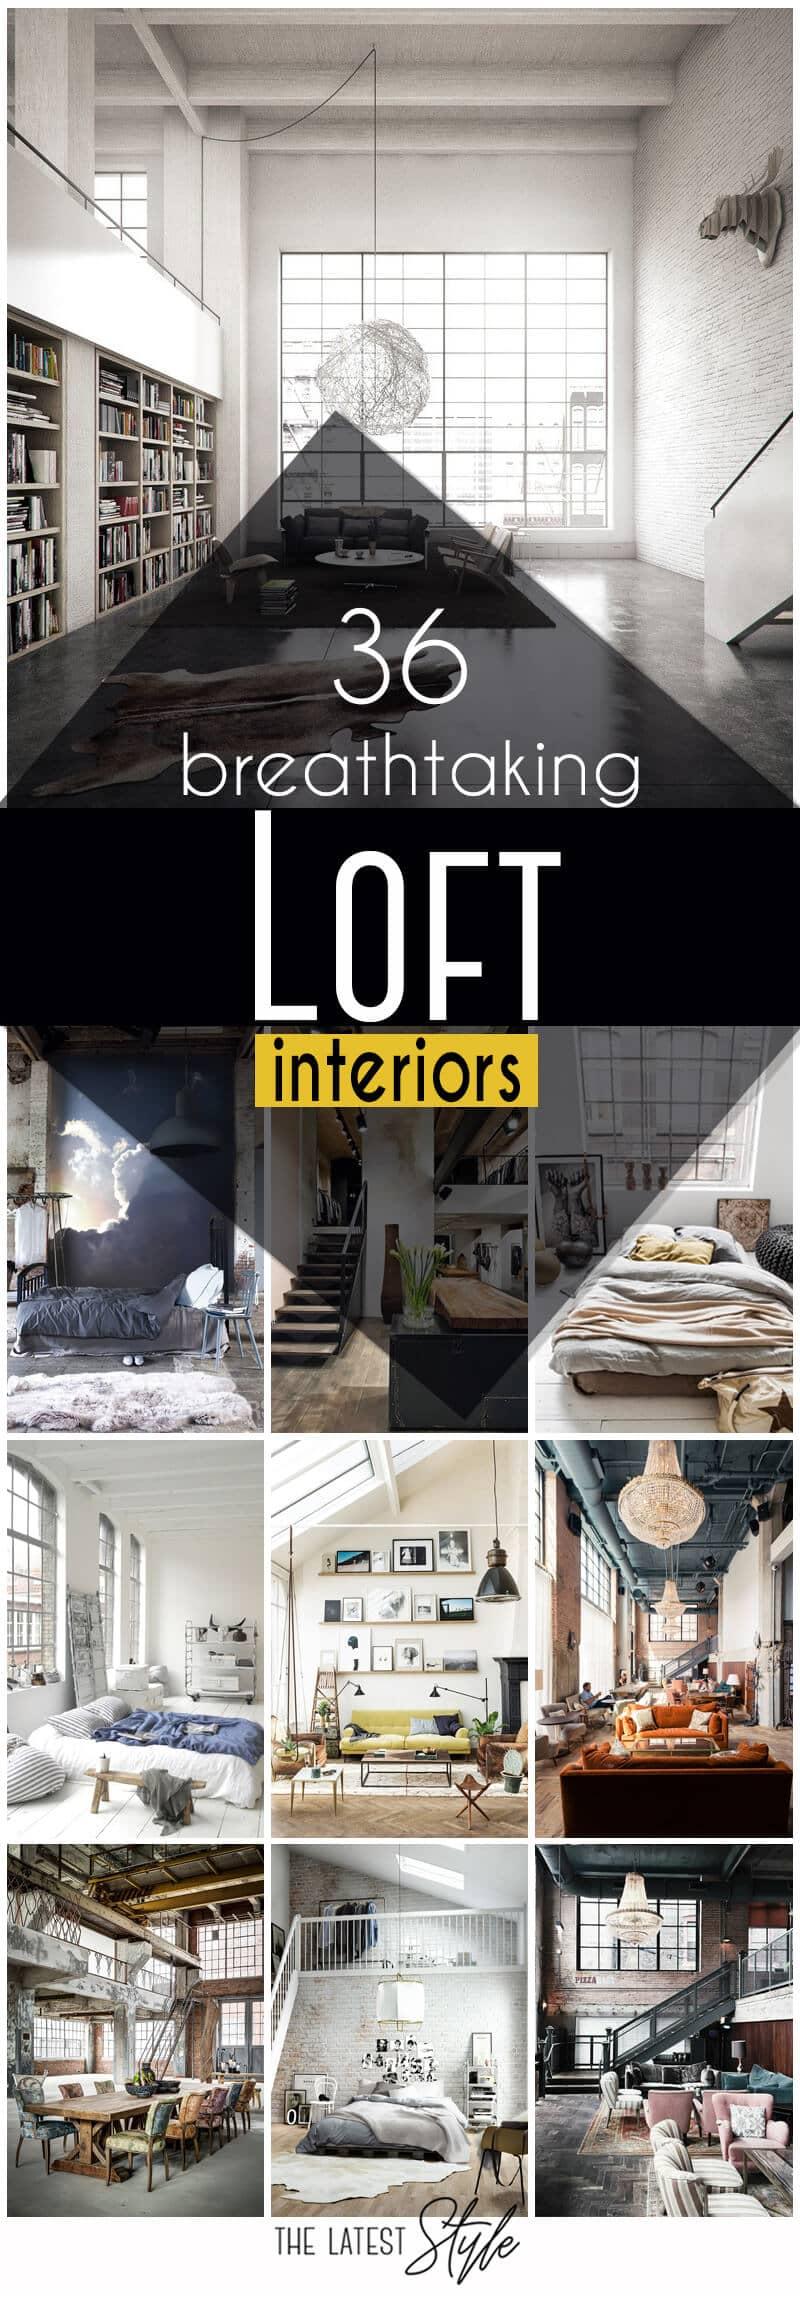 Loft Interior Designs